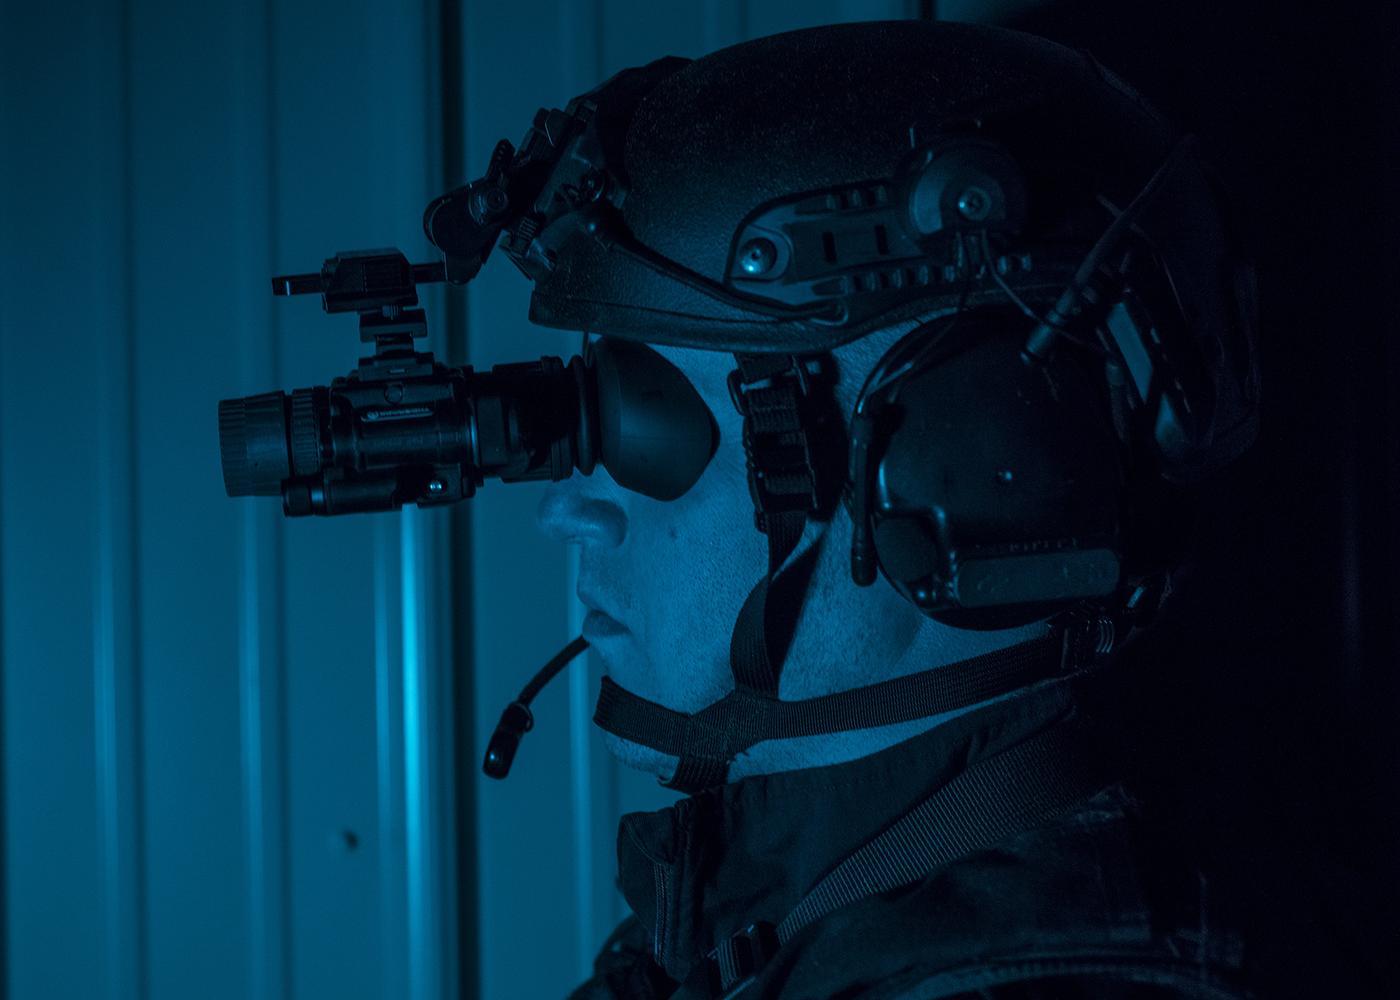 ARMASIGHT MNVD-40 2QS Night 2+ Quick